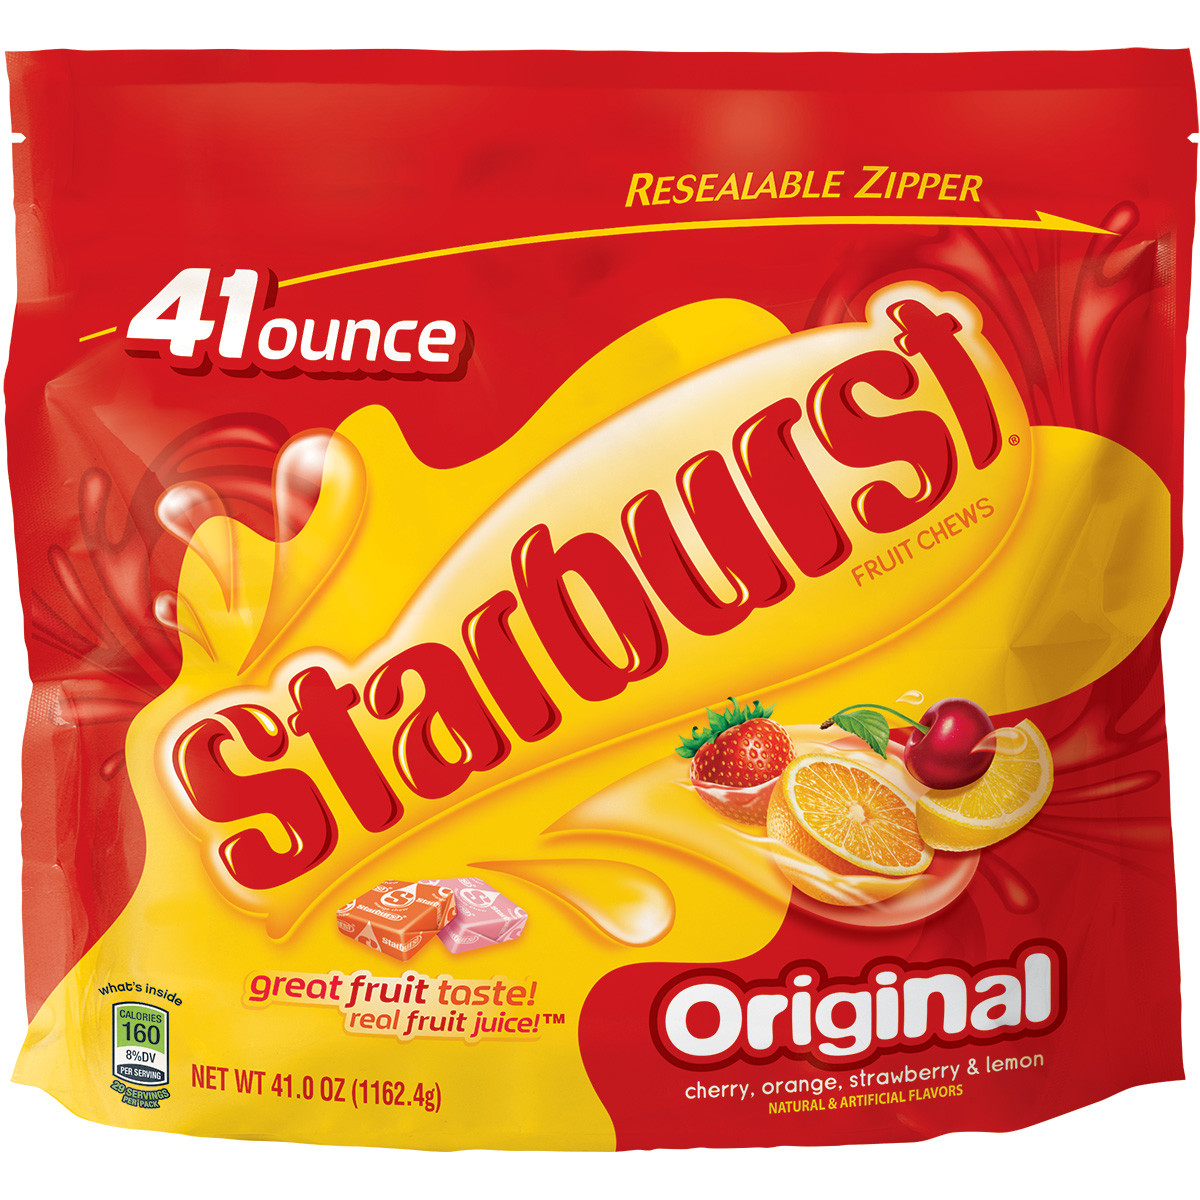 Starburst, Original Fruit Chews Candy, 41 Oz